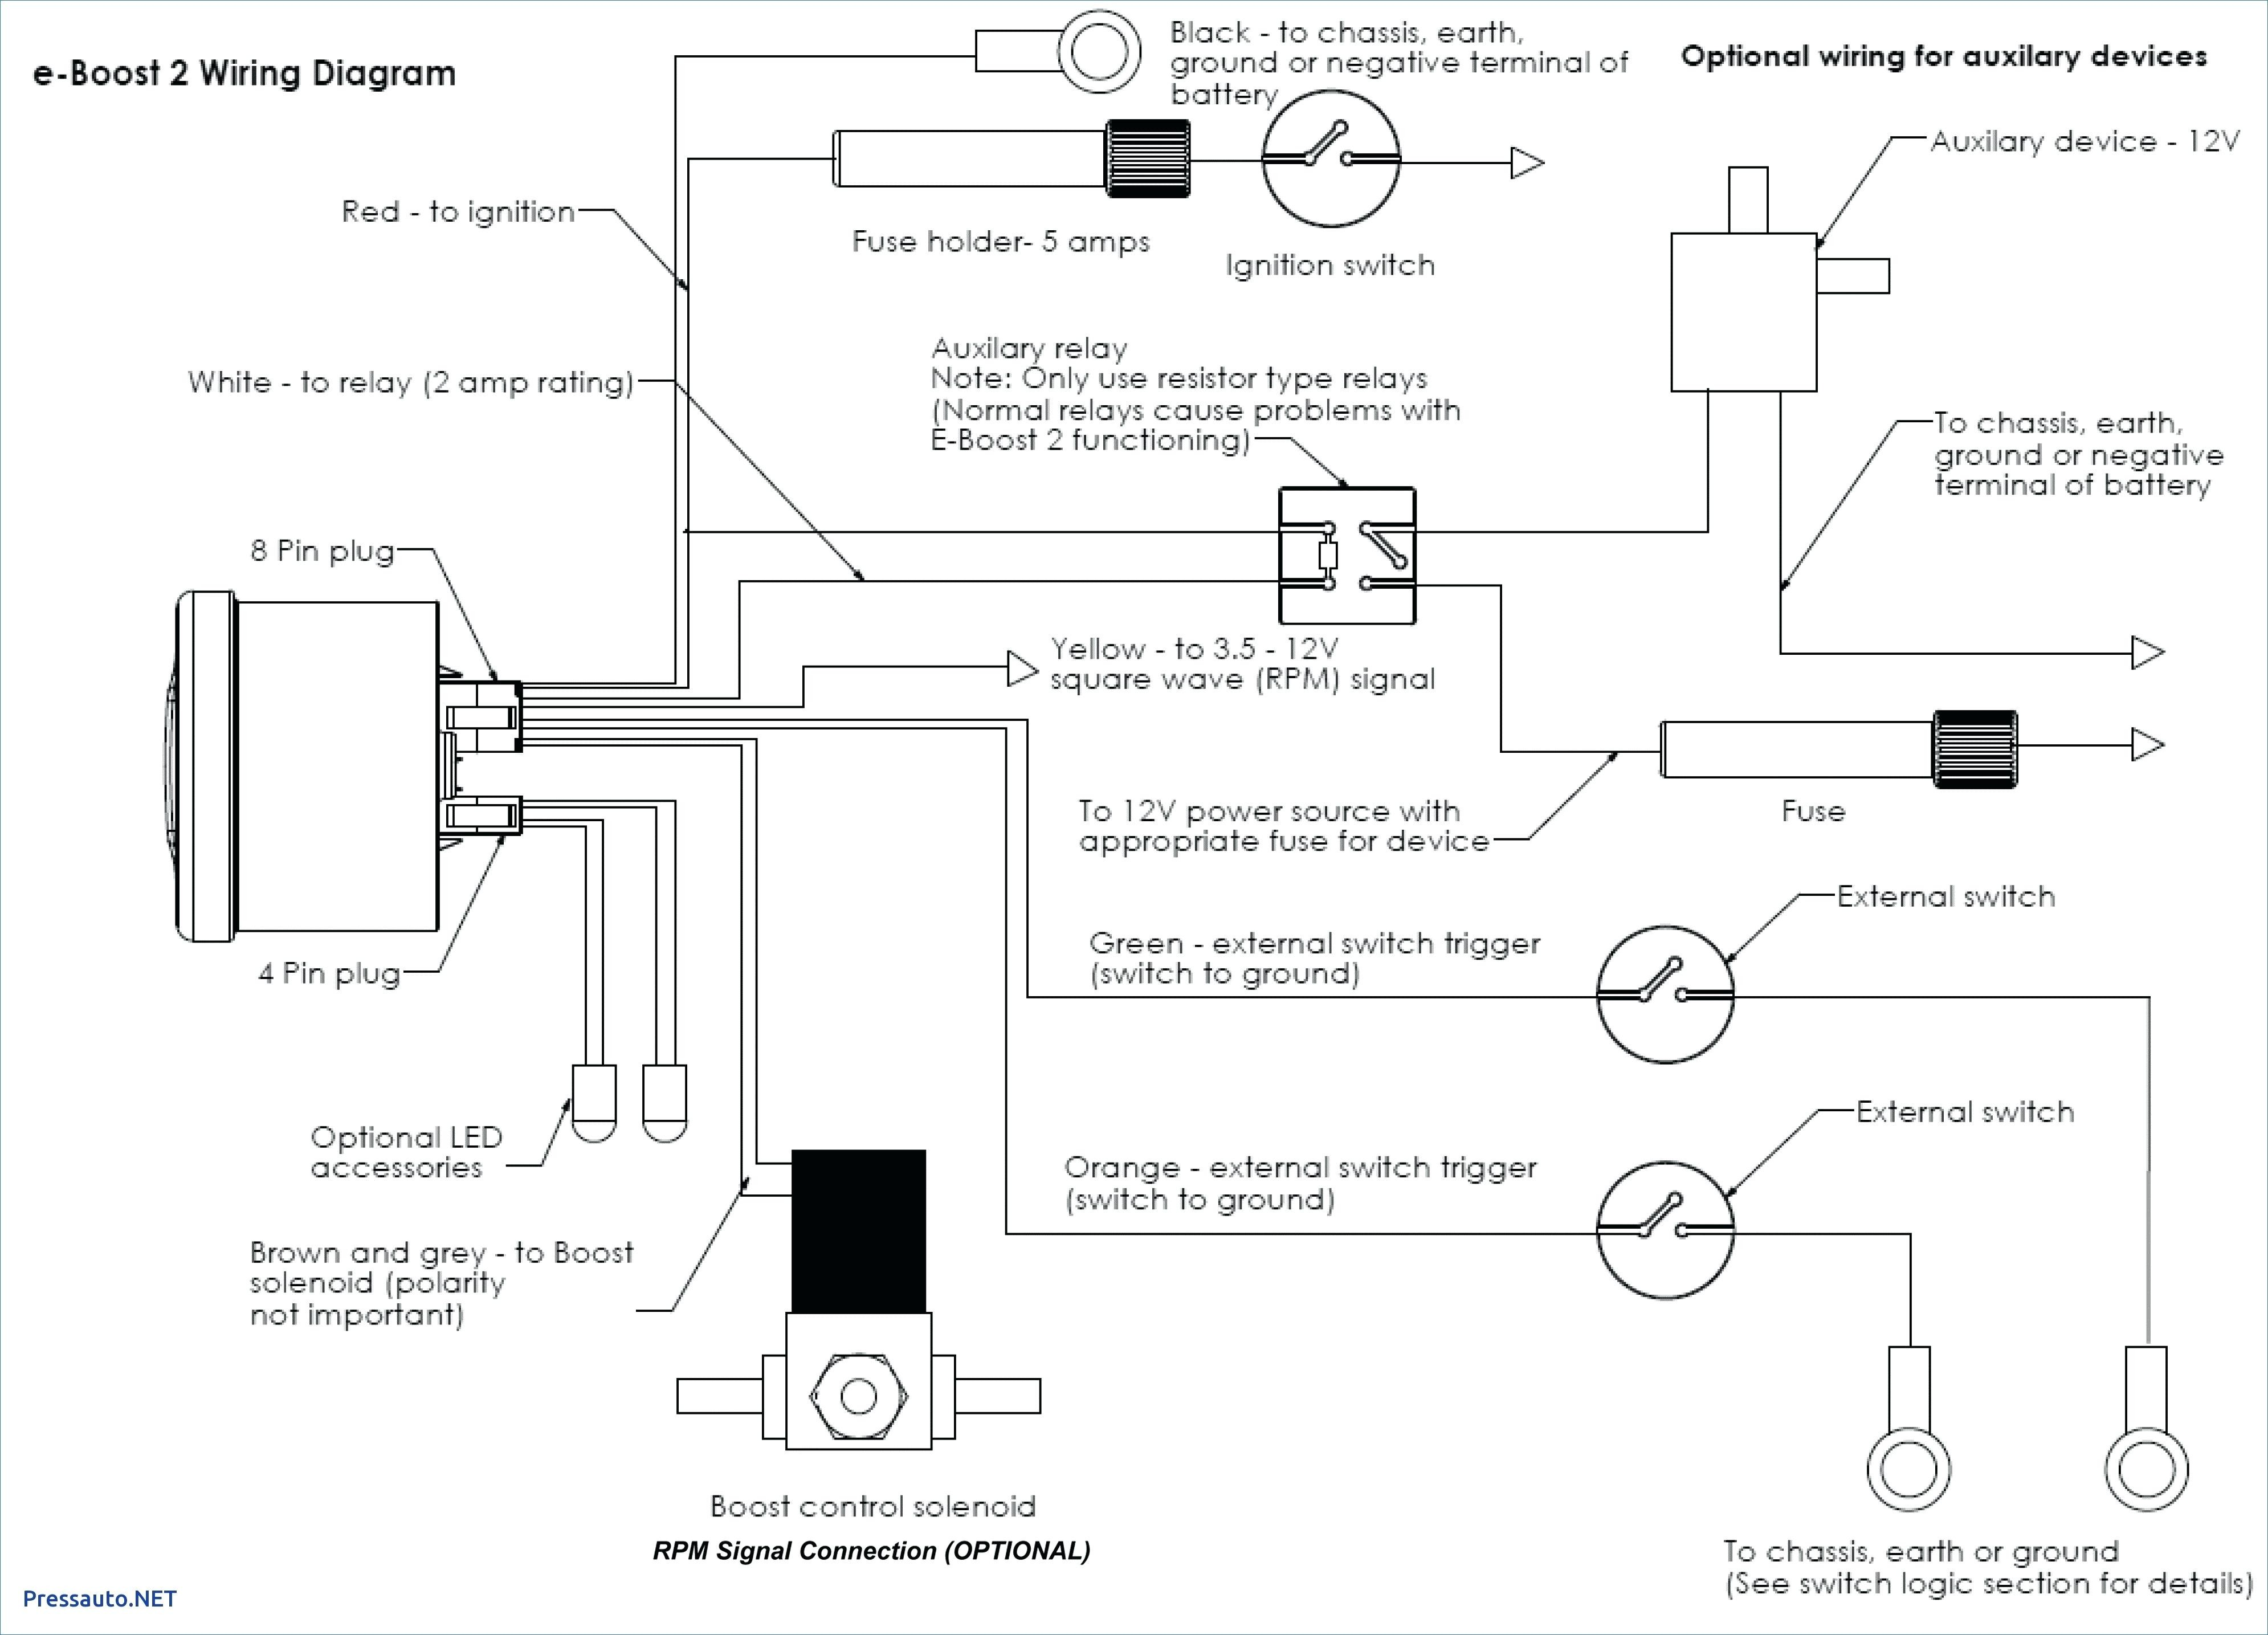 Massey Ferguson 135 Engine Diagram Wiring Alternator Terrific Tractor